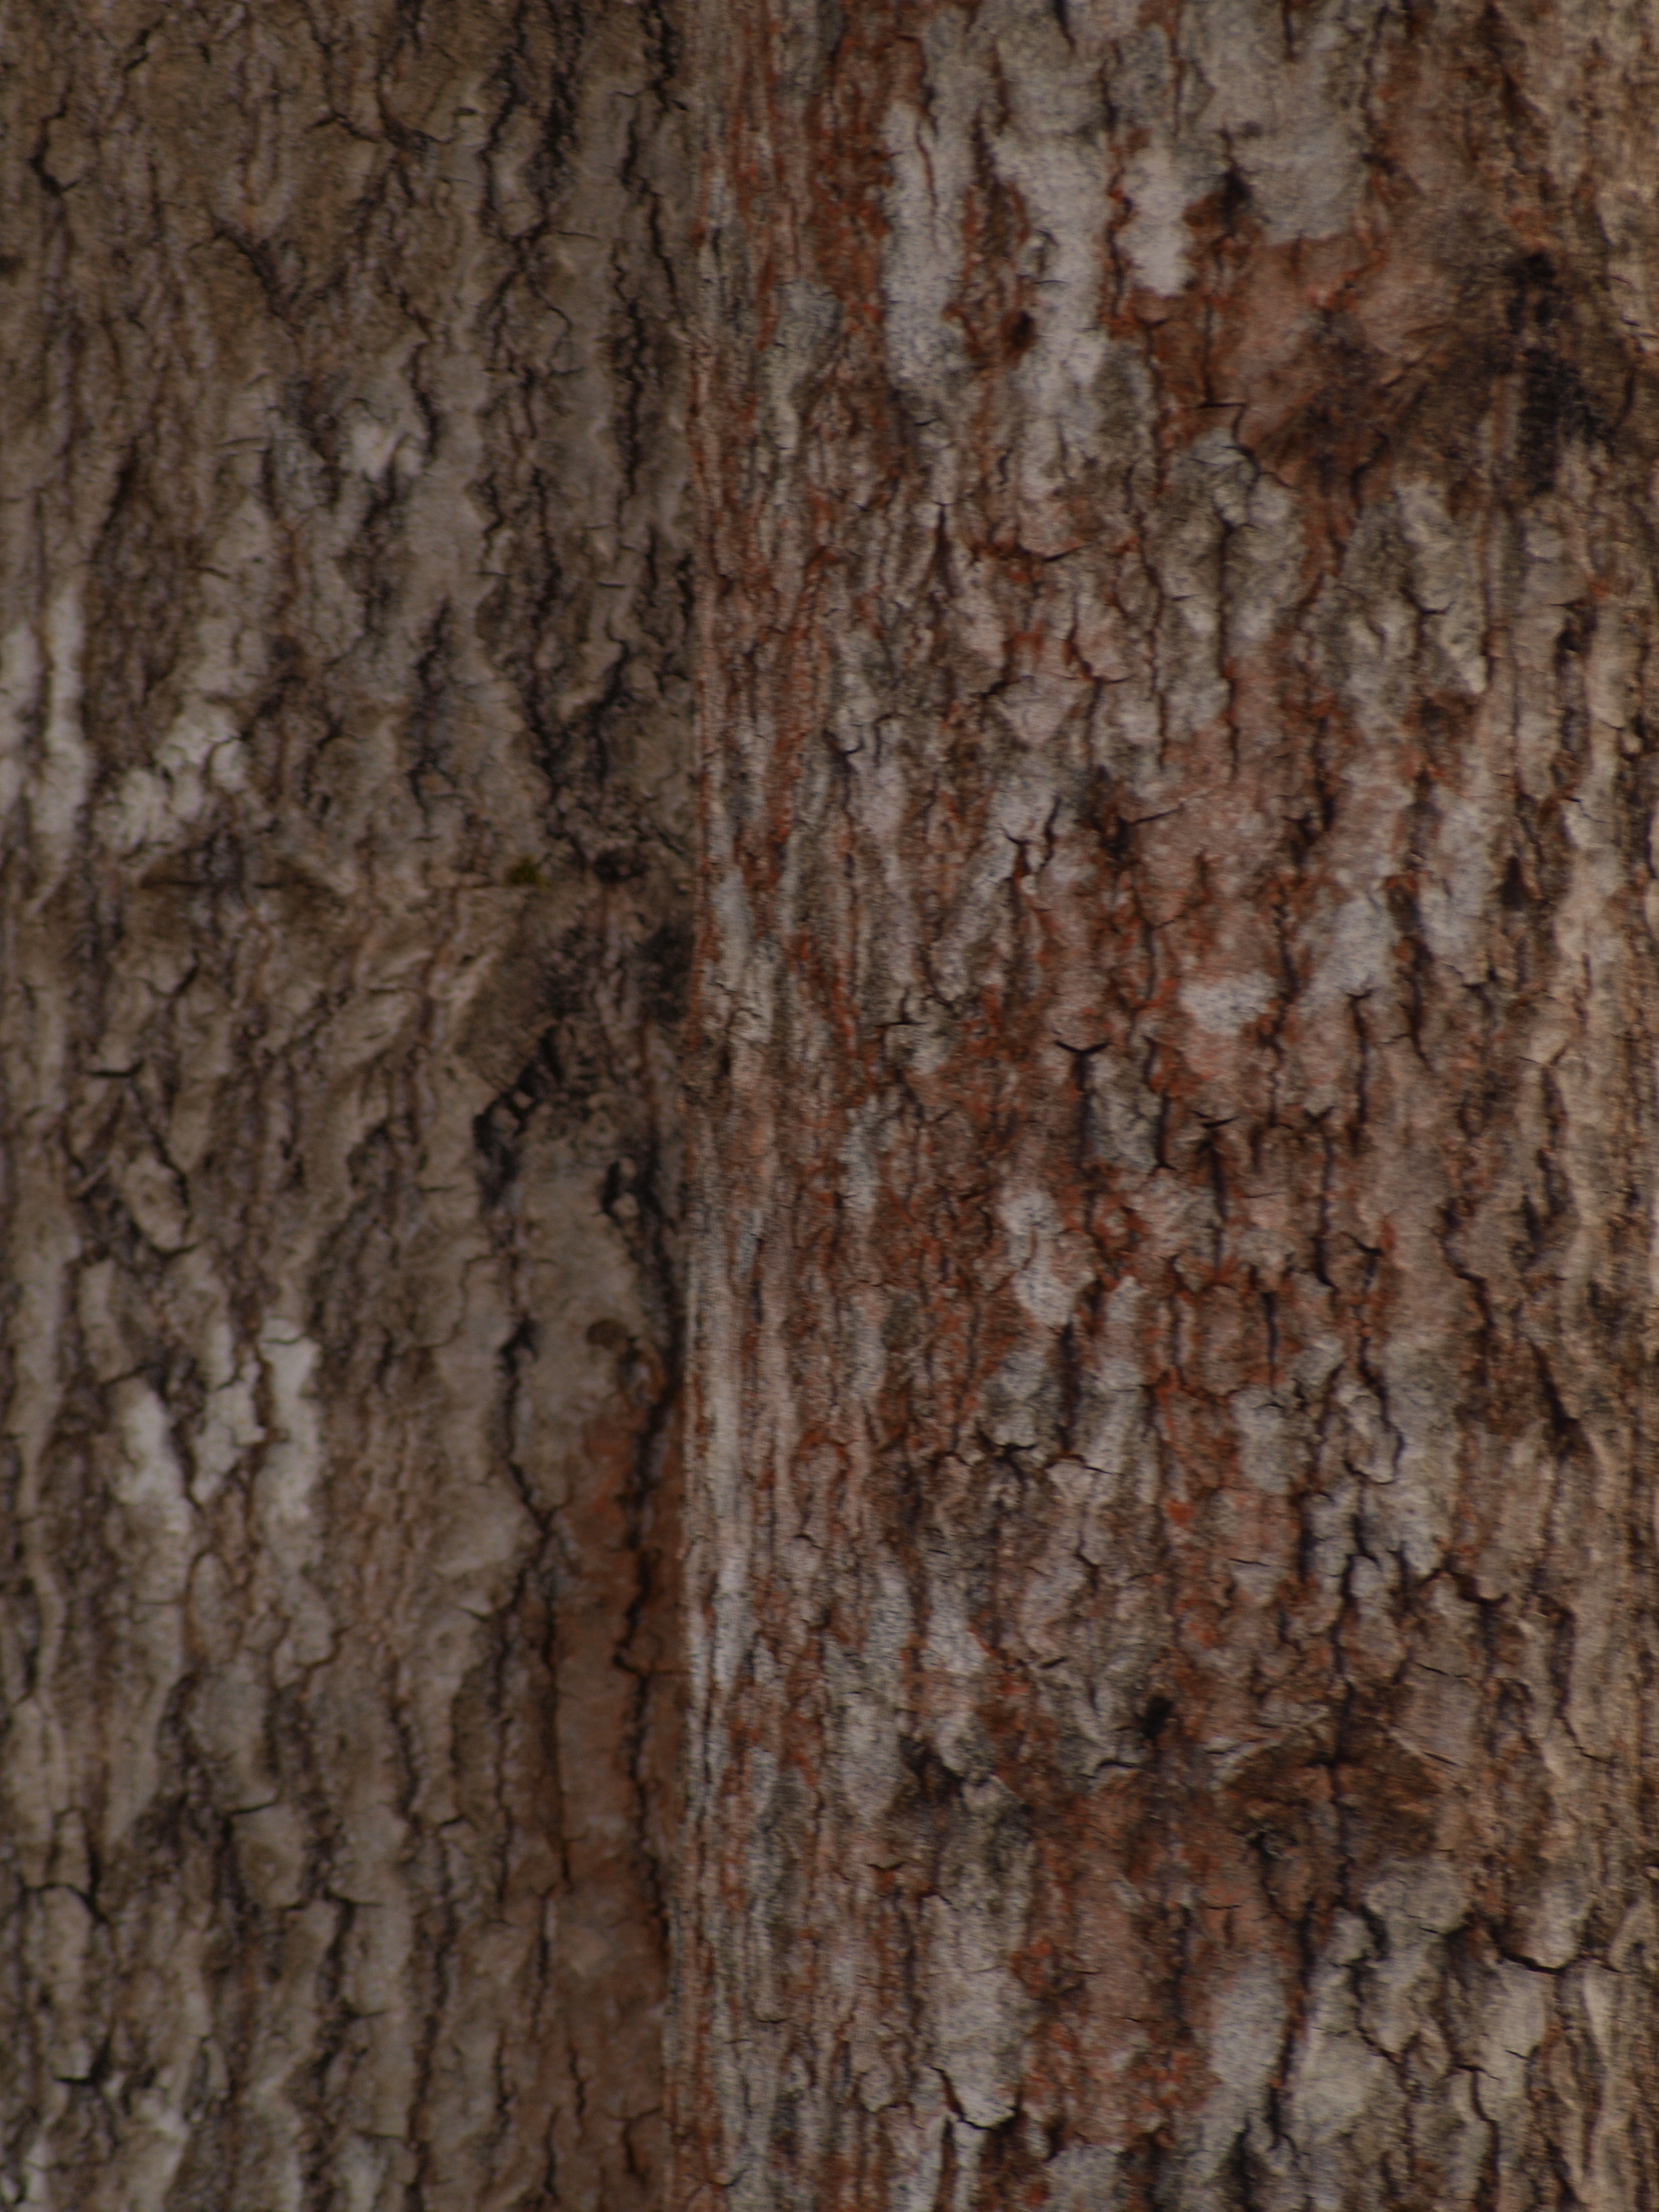 Wood Texture, Hard, Nature, Plant, Texture, HQ Photo